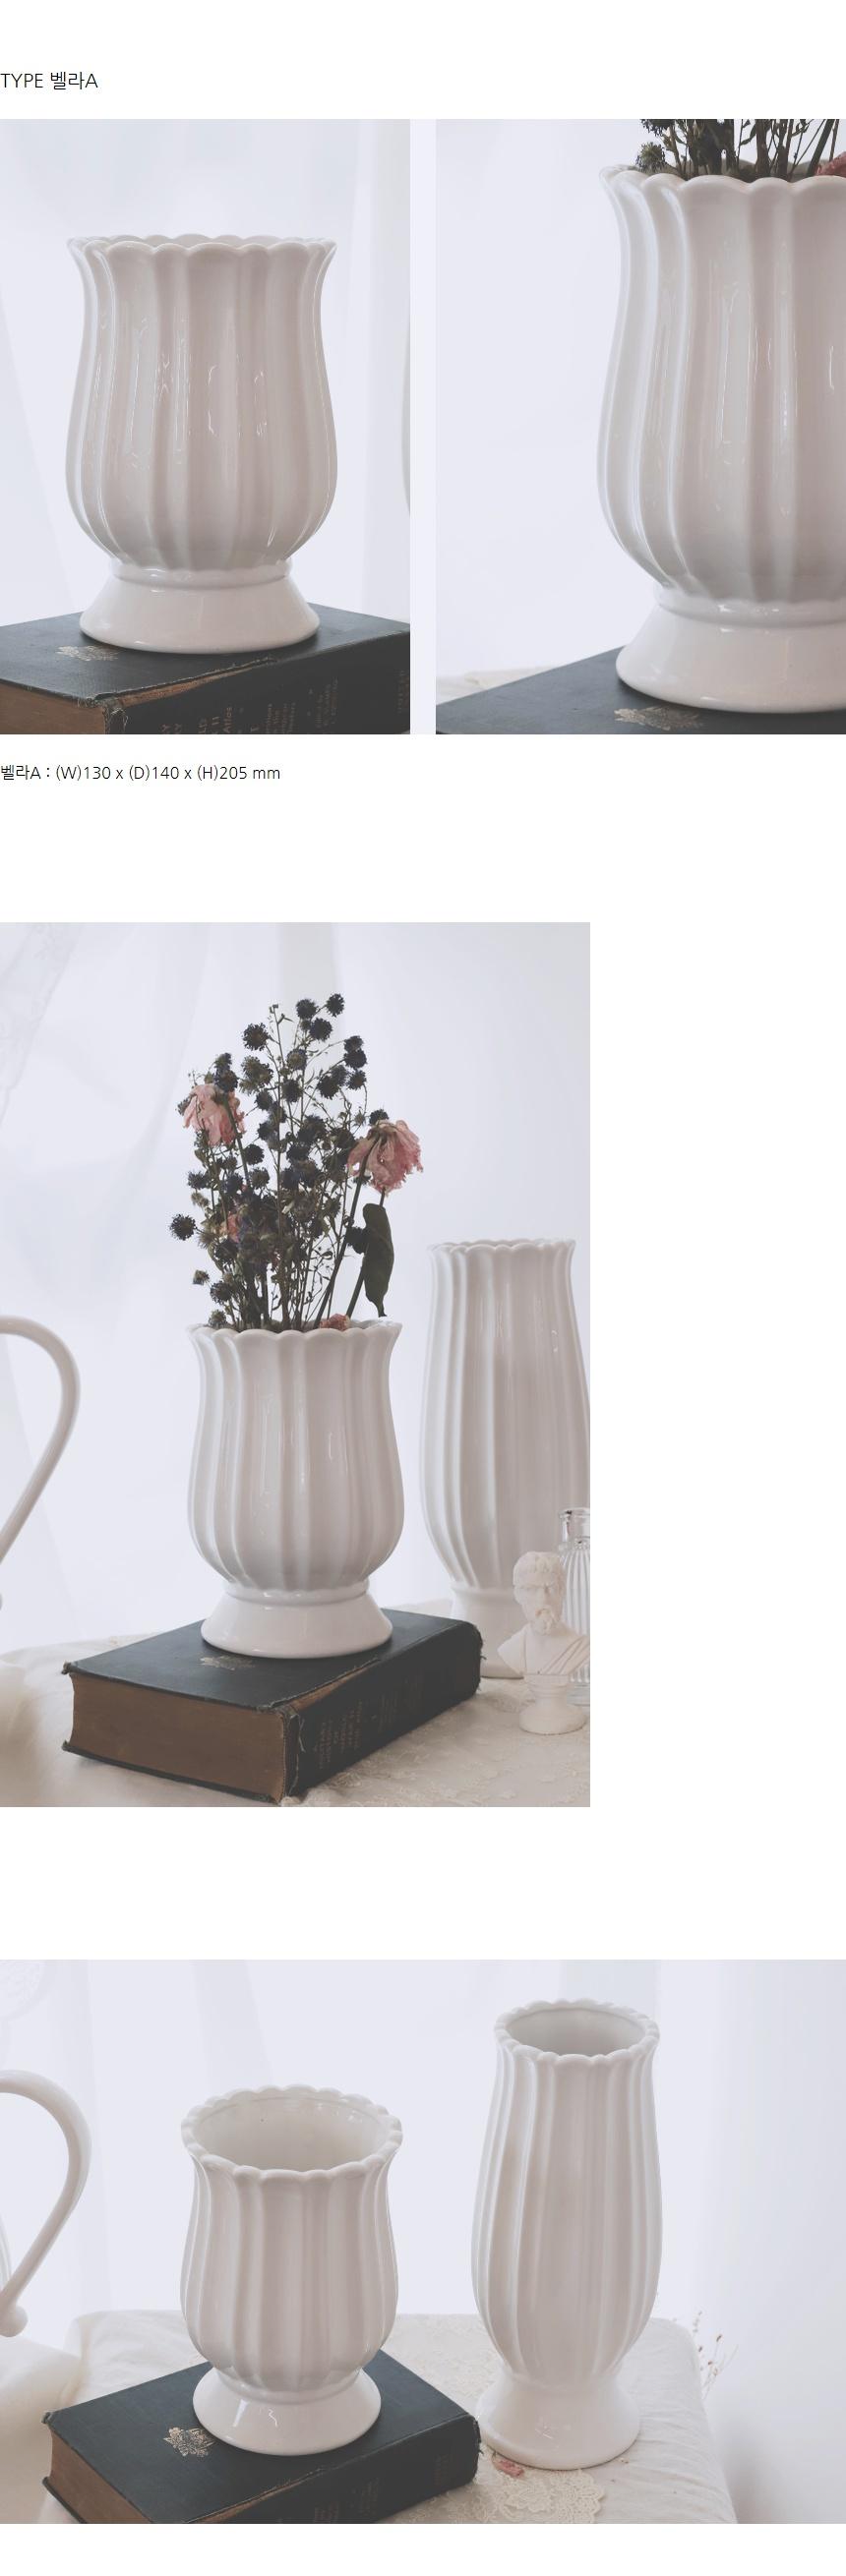 nordic_antique_pottery_vase_04.jpg